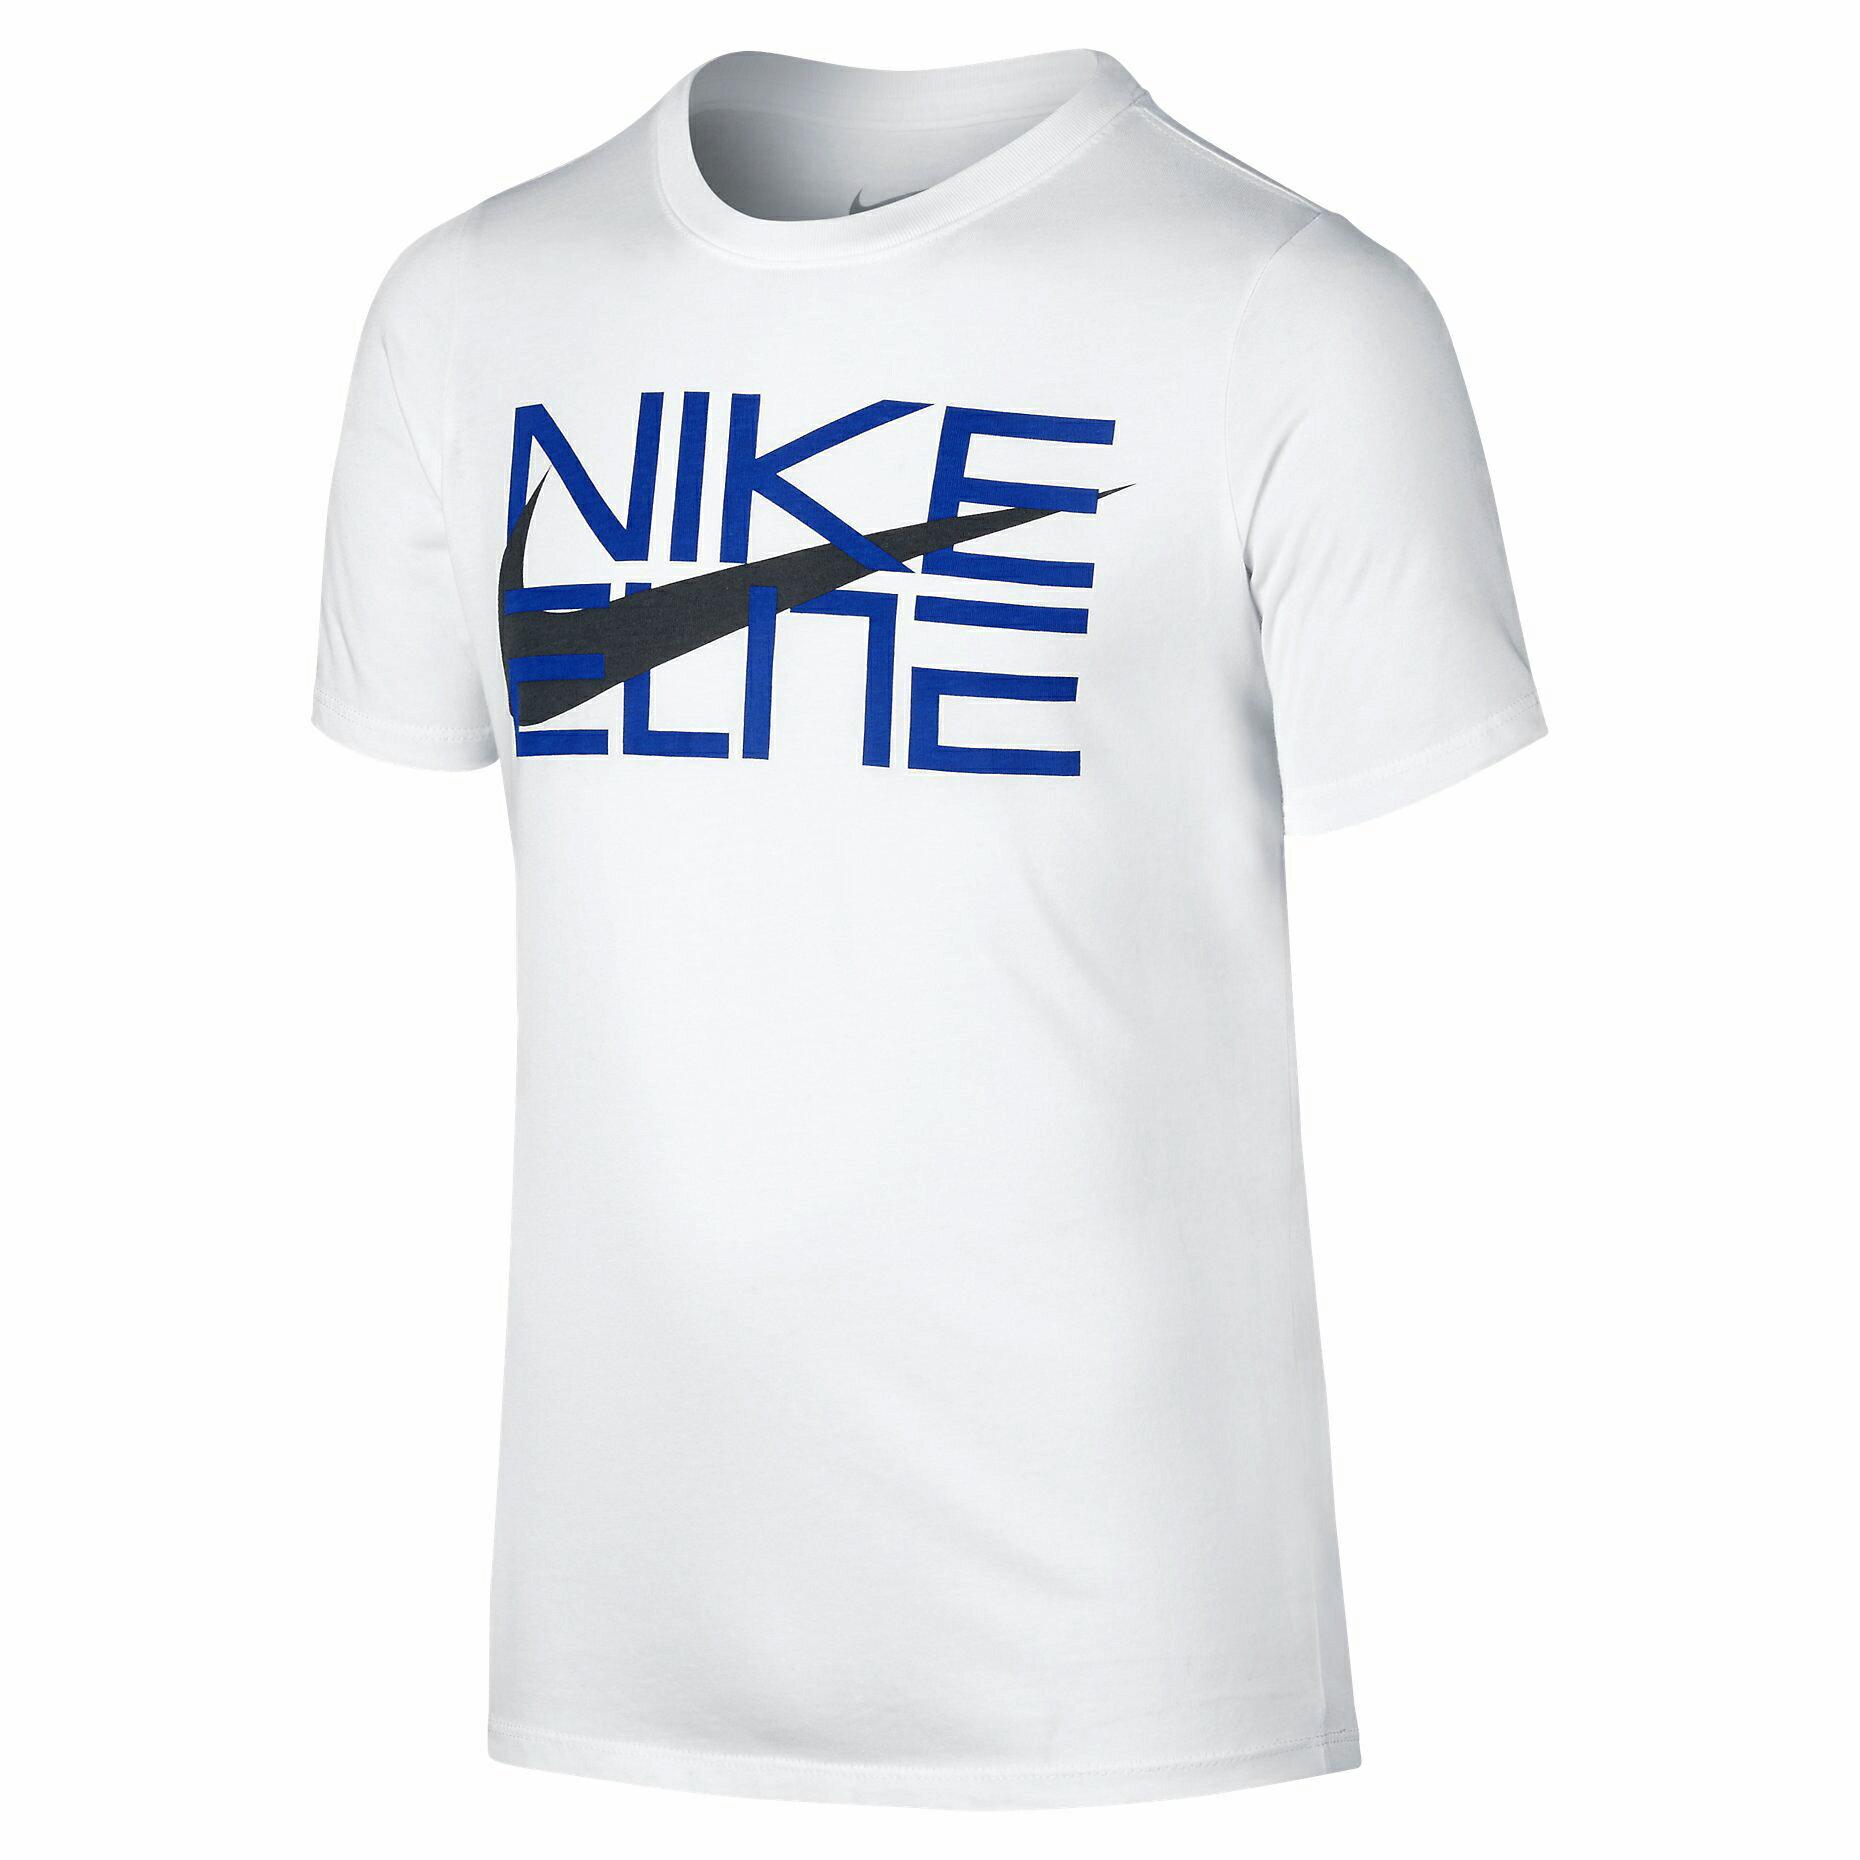 BEETLE NIKE ELITE 大勾 LOGO 字體 全白 白 藍 黑 經典 棉質 短T TEE T-SHIRT NT-86 - 限時優惠好康折扣